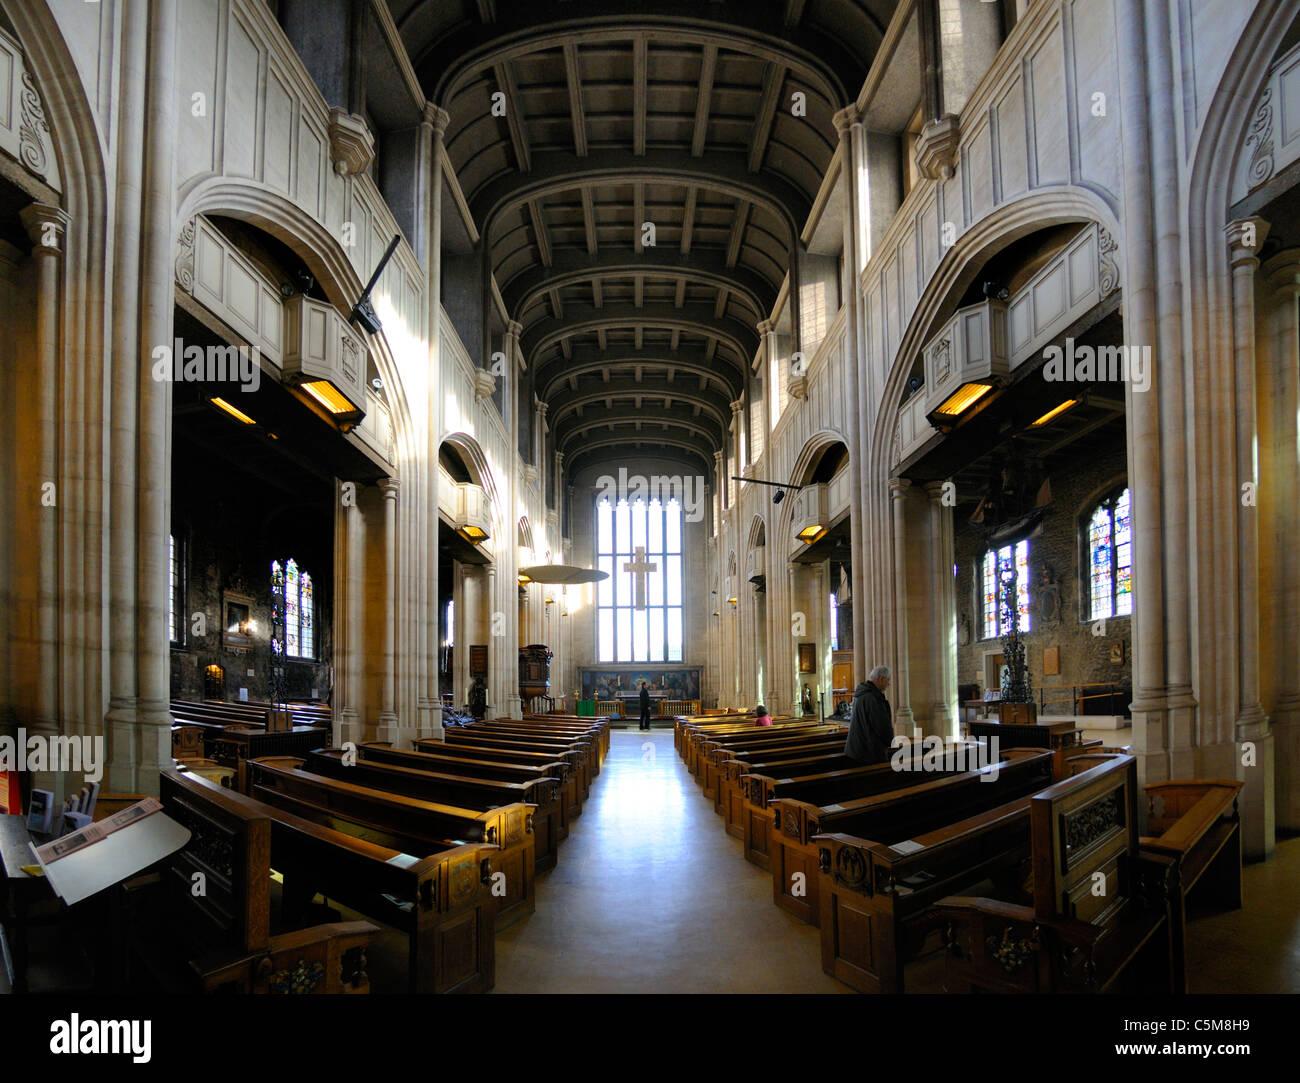 Tower London Interior Stockfotos & Tower London Interior Bilder - Alamy